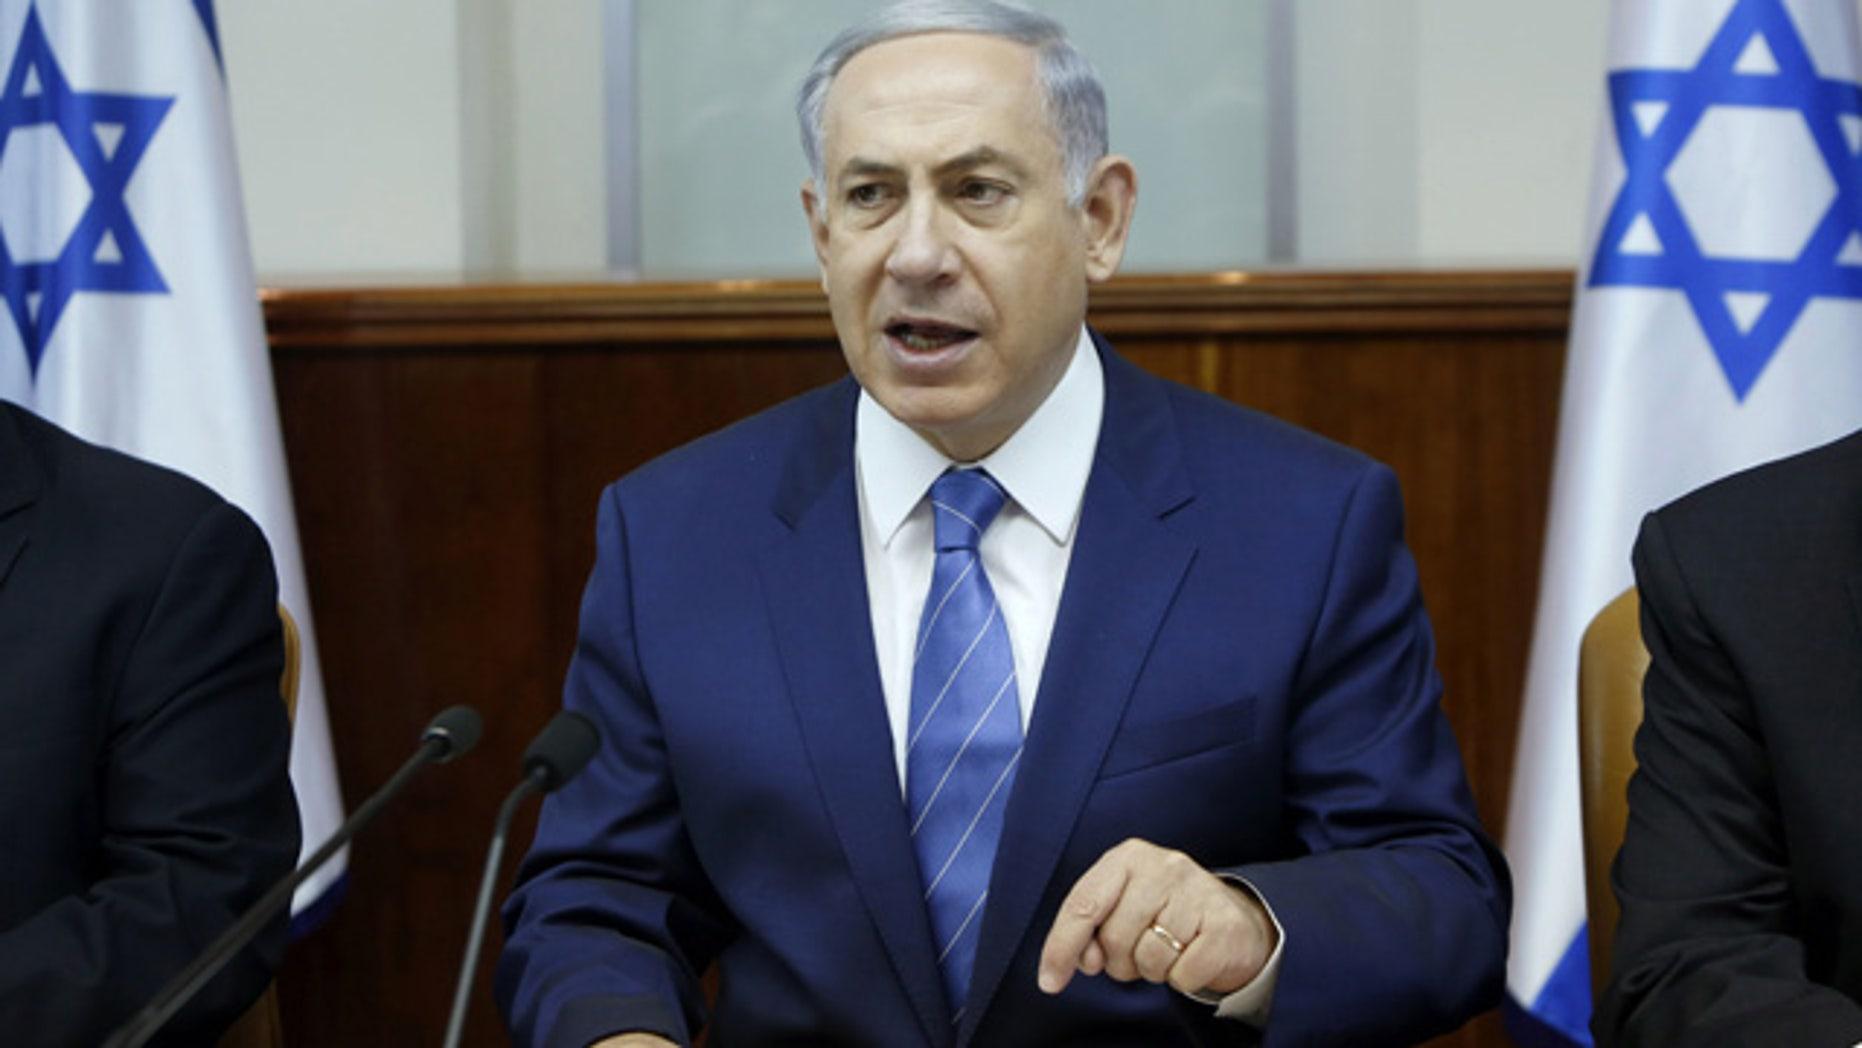 August 2, 2015: Israel's Prime Minister Benjamin Netanyahu chairs the weekly cabinet meeting in Jerusalem. (Gali Tibbon/Pool Photo via AP)